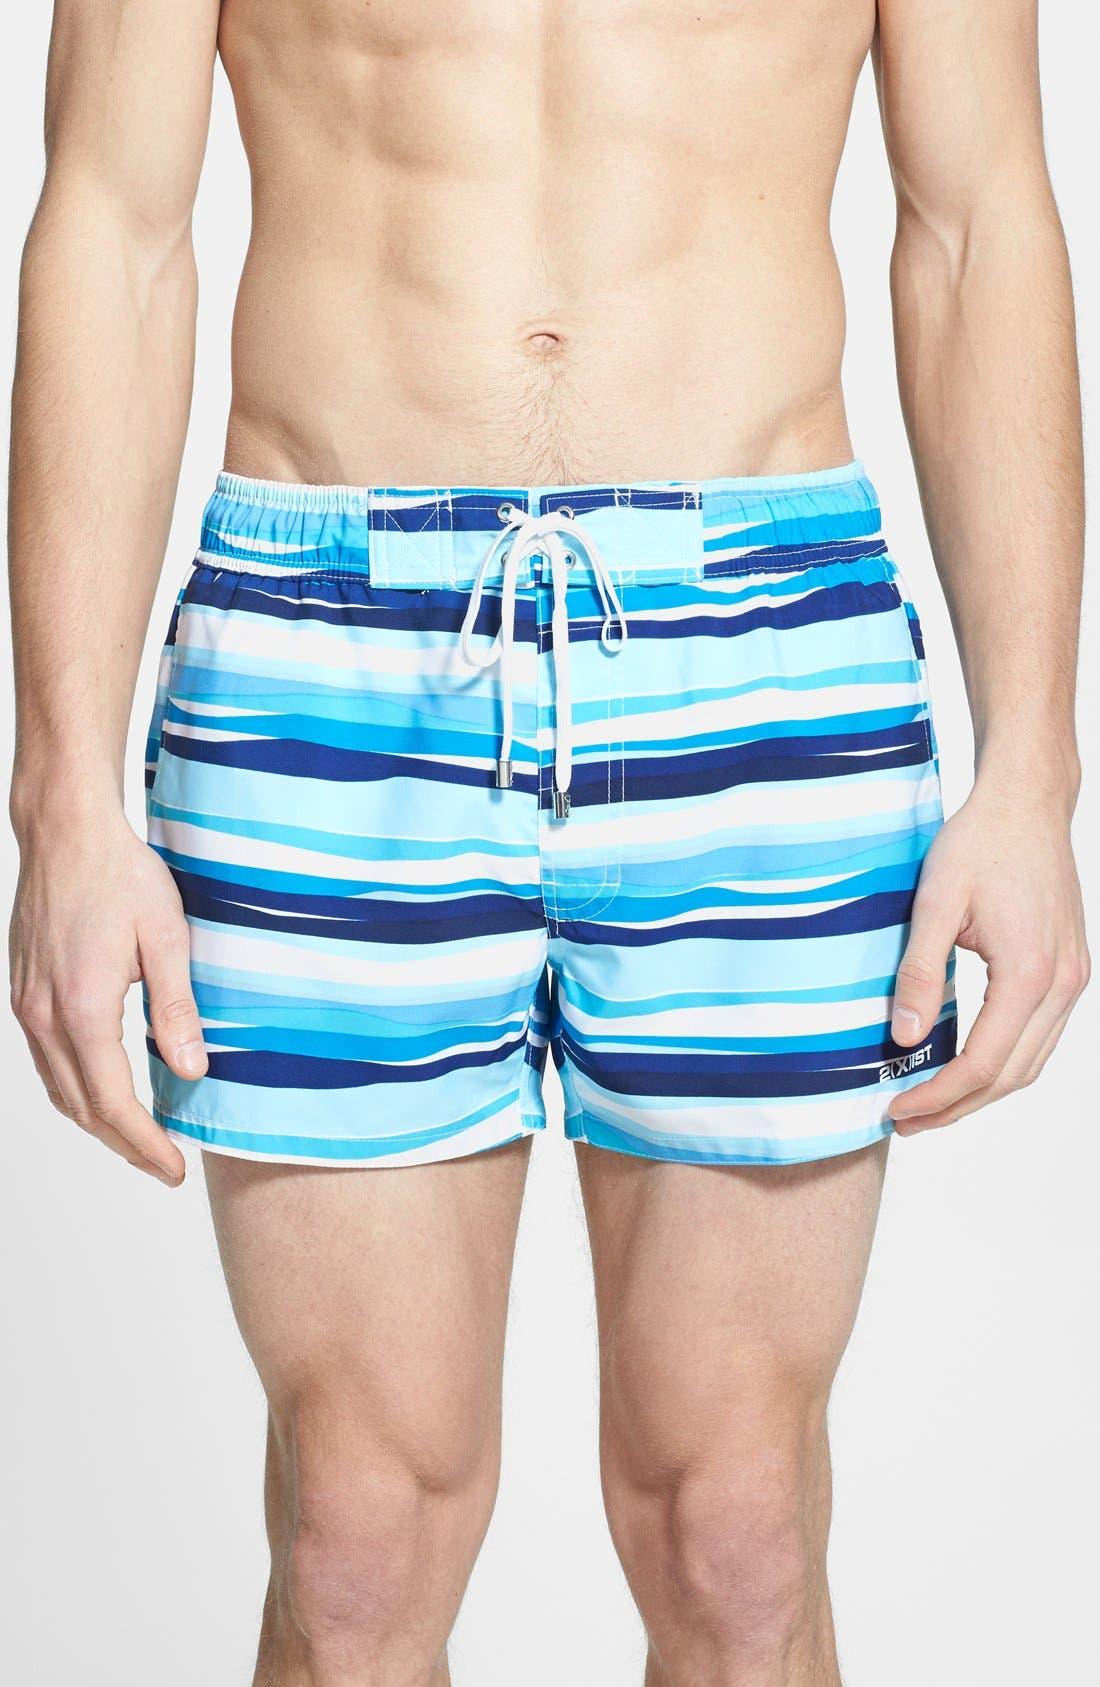 Alternate Image 1 Selected - 2(x)ist 'Ibiza' Stripe Swim Trunks